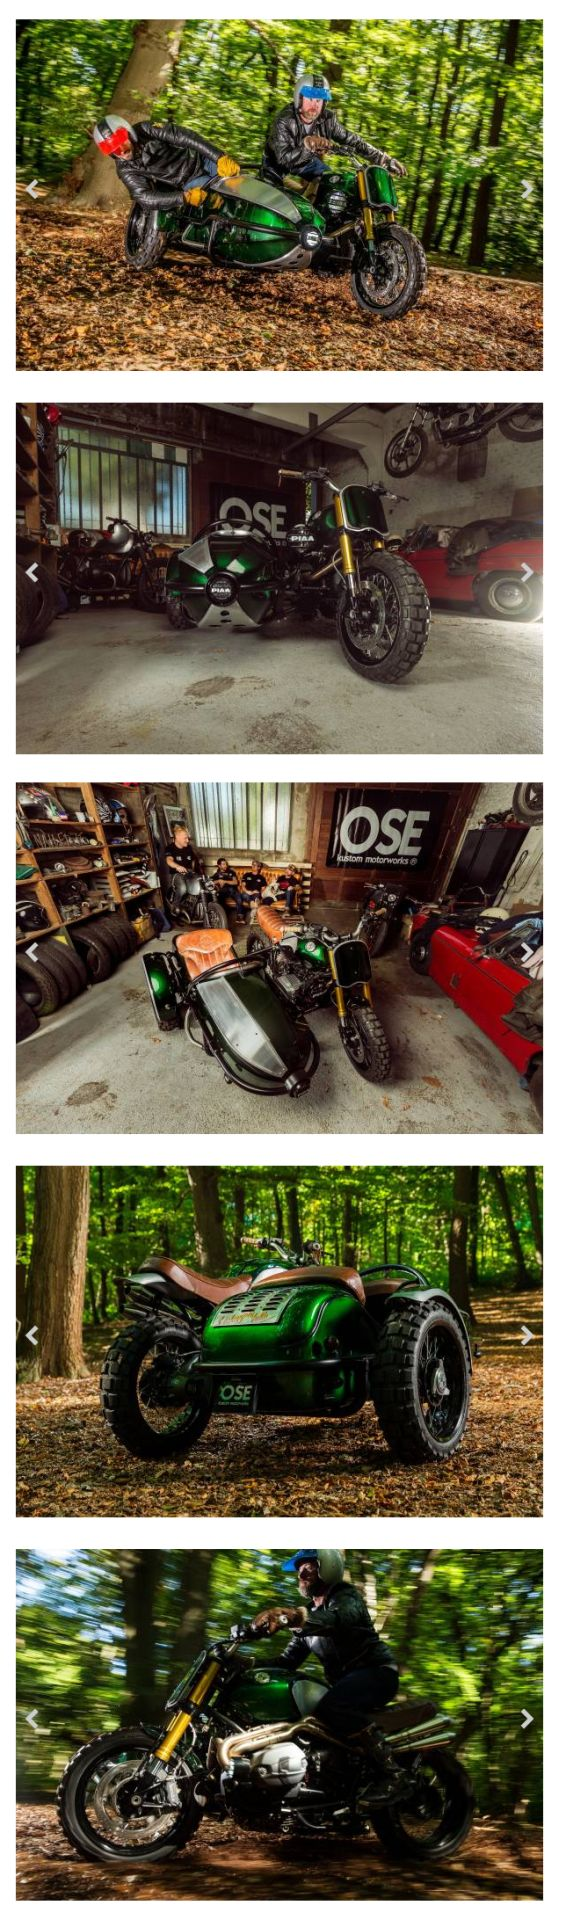 BMW R nineT Scrambler Sidecar - Old School Engineering #motorcycles #scrambler #motos | caferacerpasion.com